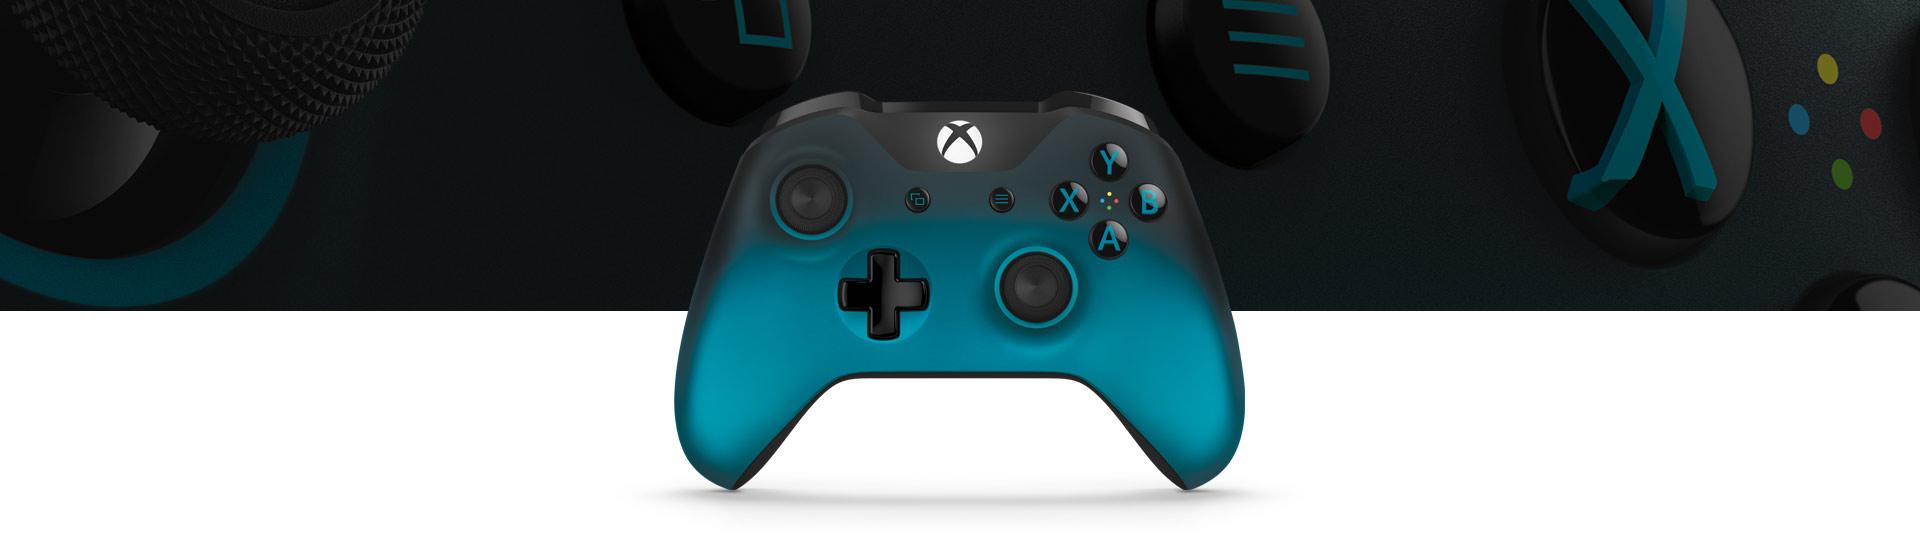 Bezdrátový ovladač pro Xbox ze speciální edice Ocean Shadow